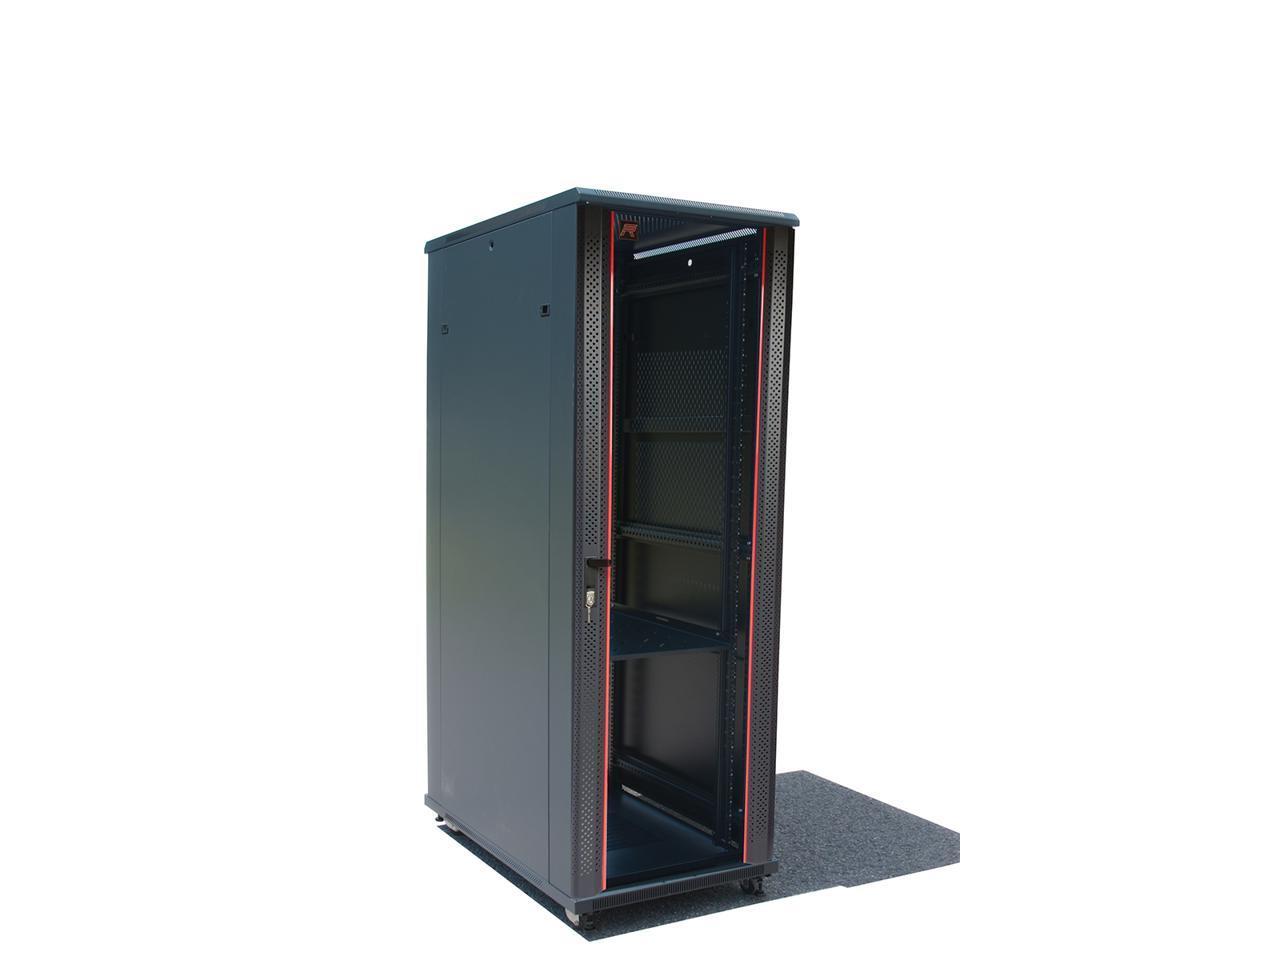 32u 39 depth it telecom server rack cabinet glass door air control panel 4fans 1pdu 1 shelf free